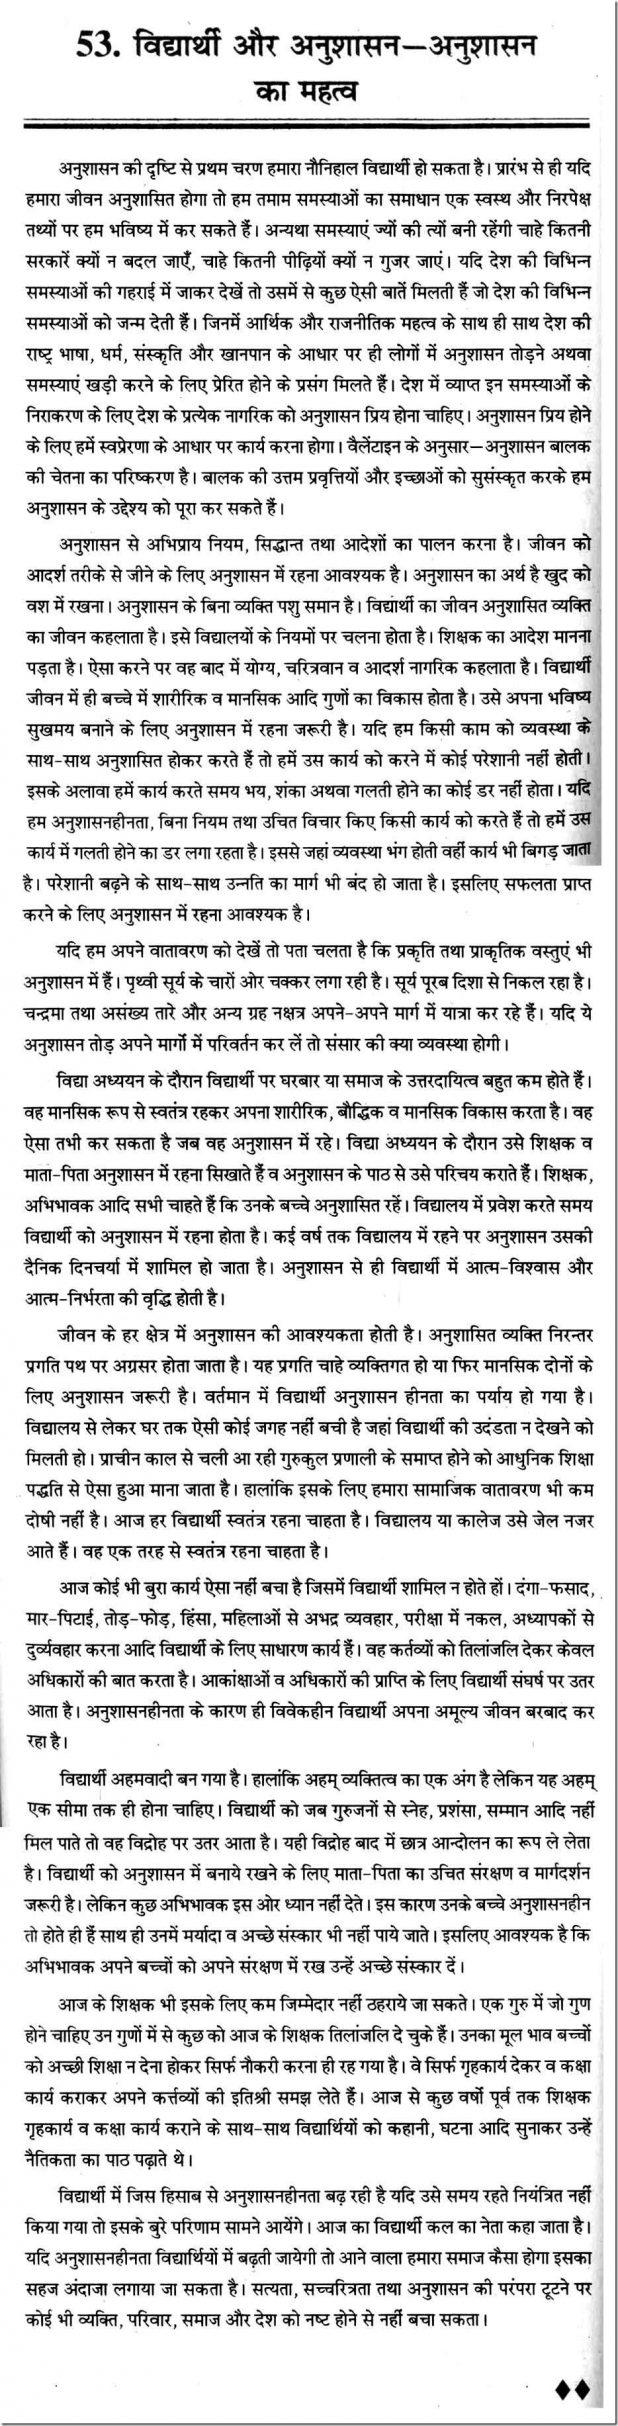 008 Studentife Essay Thumb In Nepali Punjabi Person Technology Collegeanguage Topics Hindi For Of Athlete Sanskrit Kannada Pdf English Class 618x2426 Example Importance Best College Life On Discipline Full